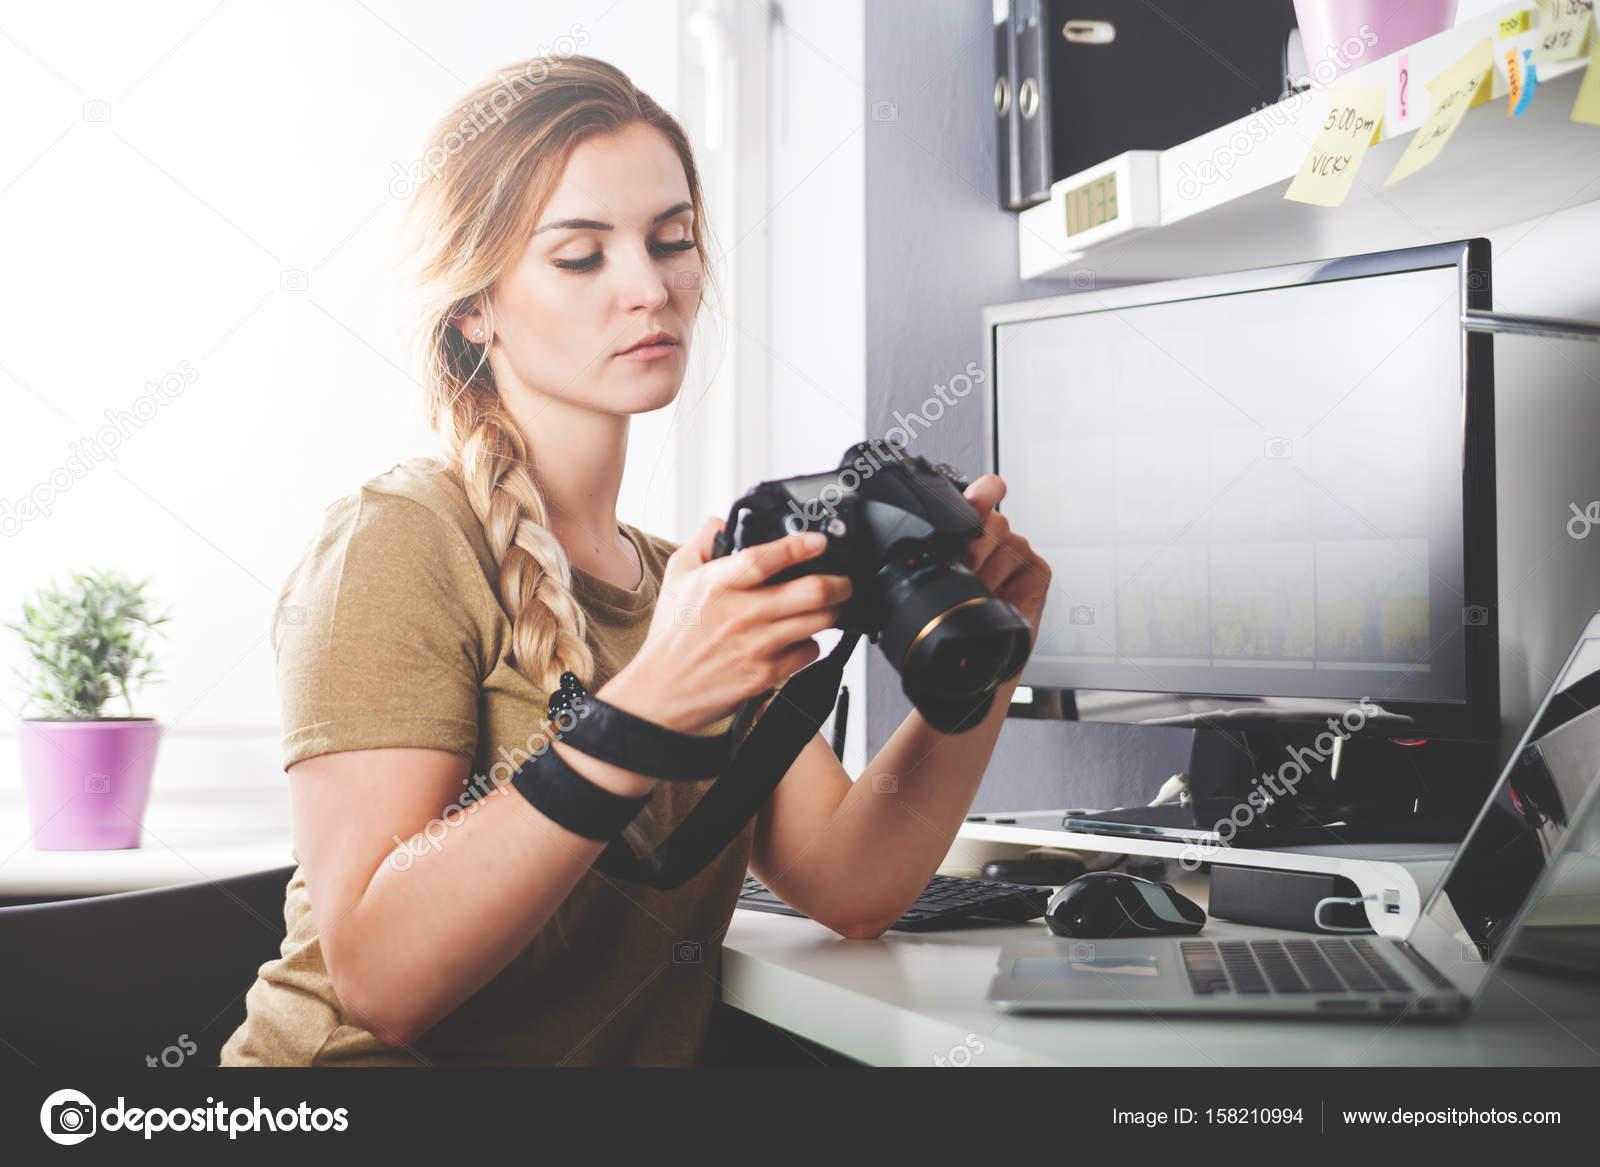 Кто такой фриланс фотограф фриланс спб работа